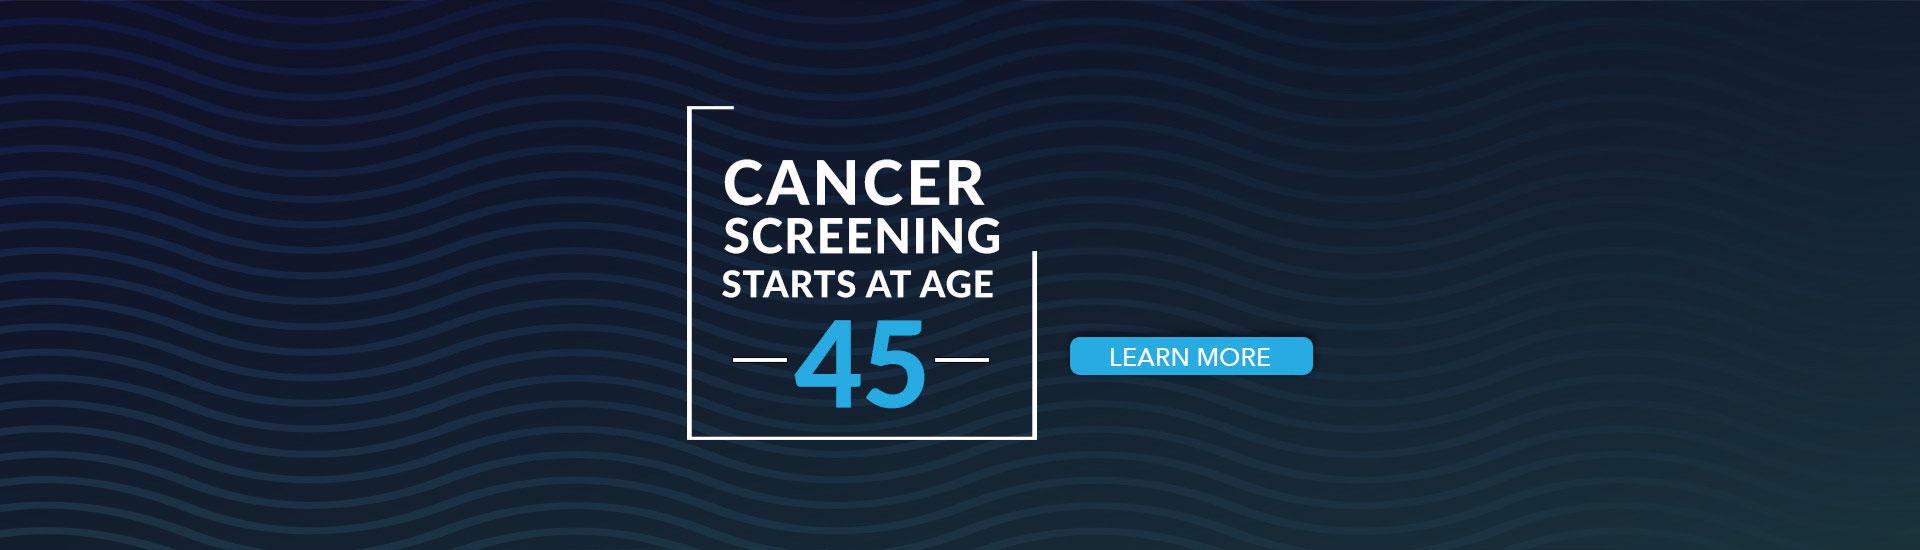 Cancer Screening Starts at Age 45